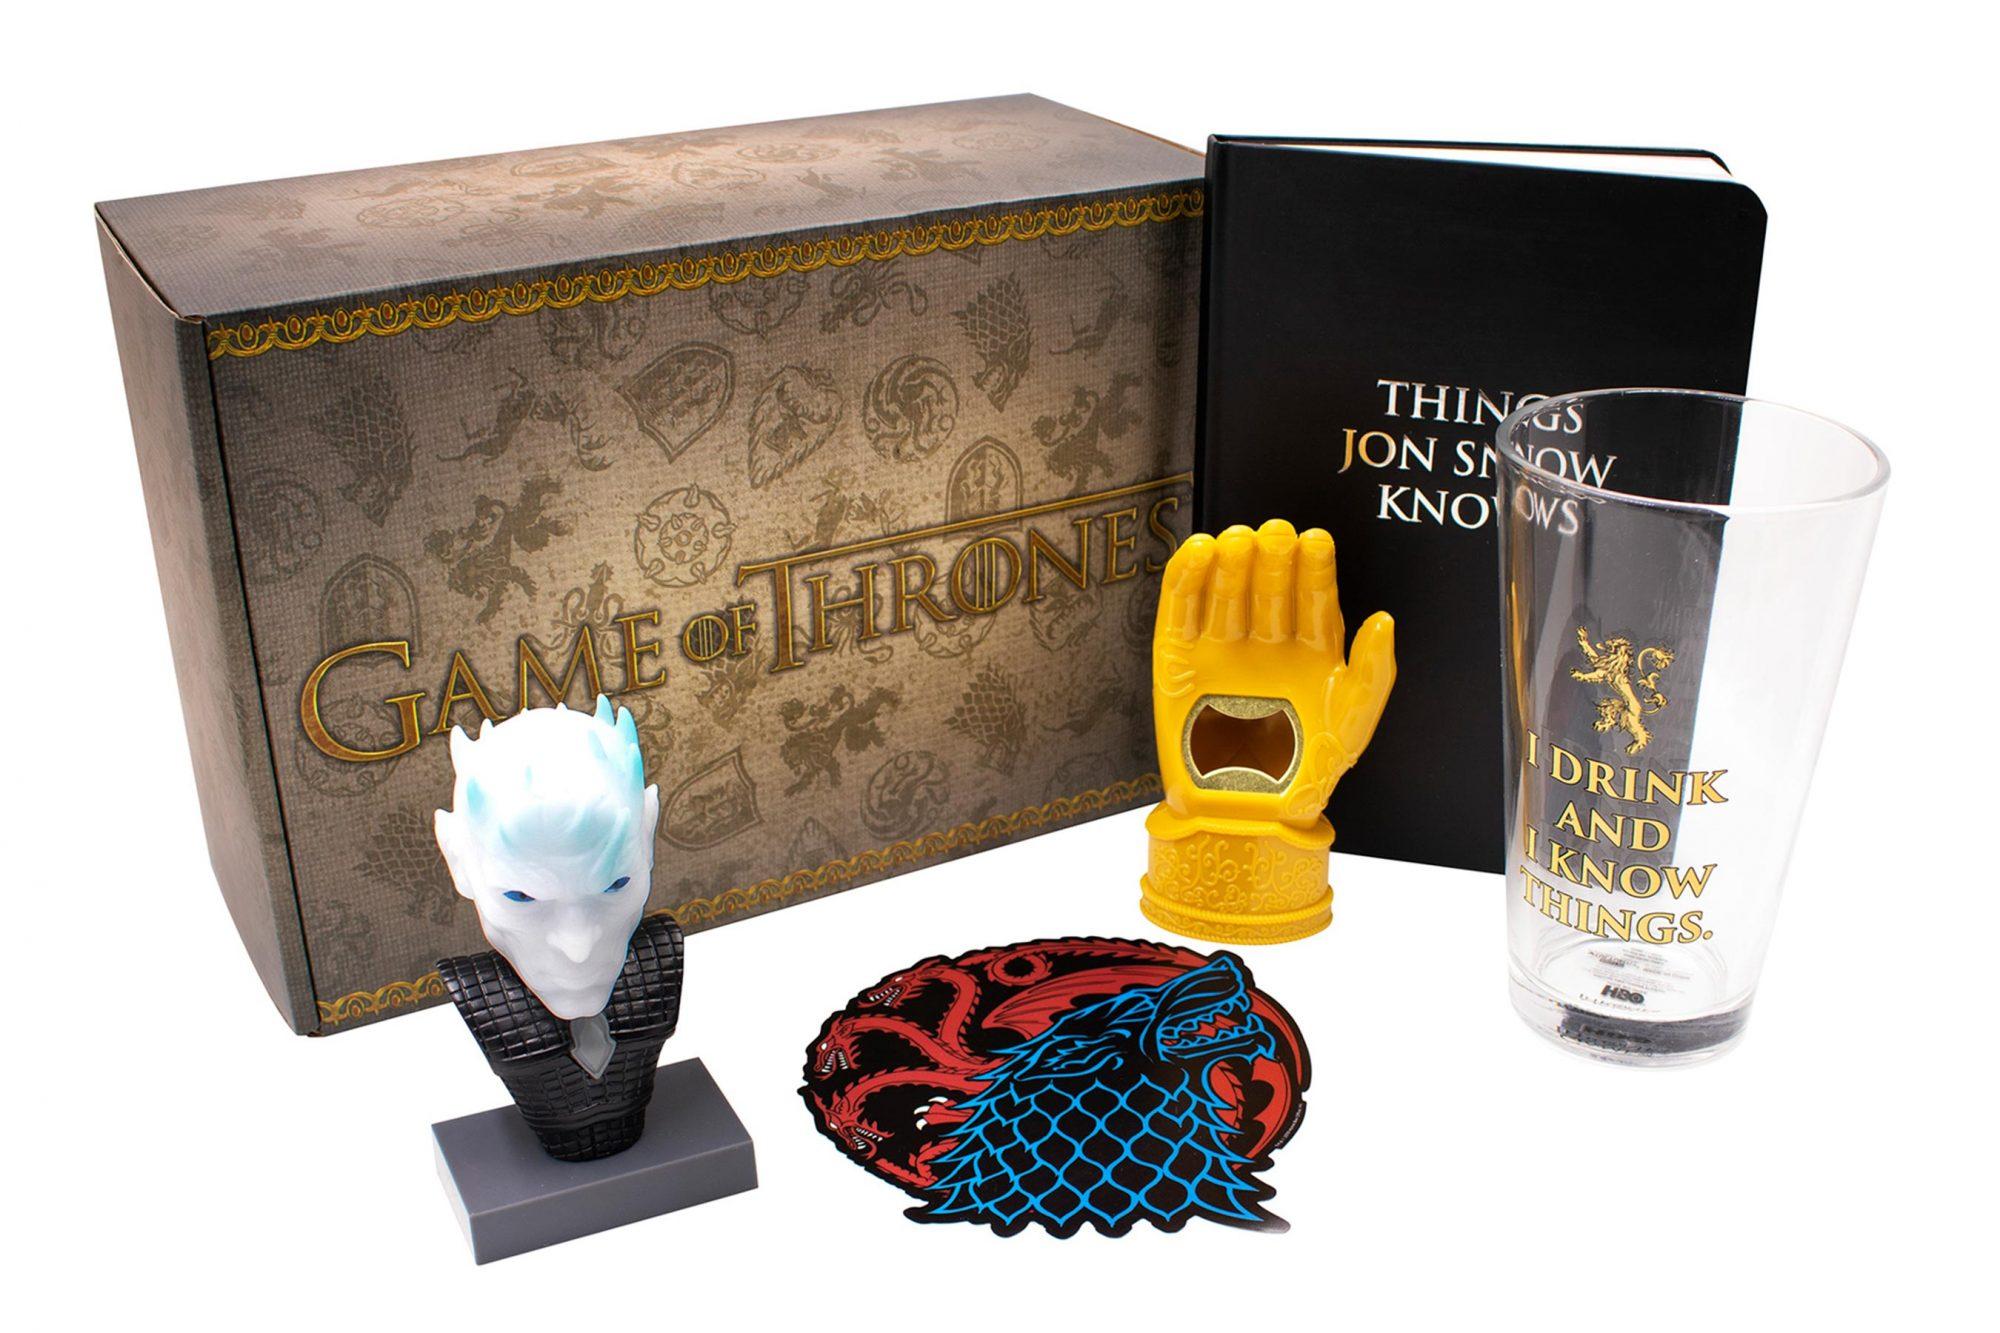 Game of Thrones Merchandise